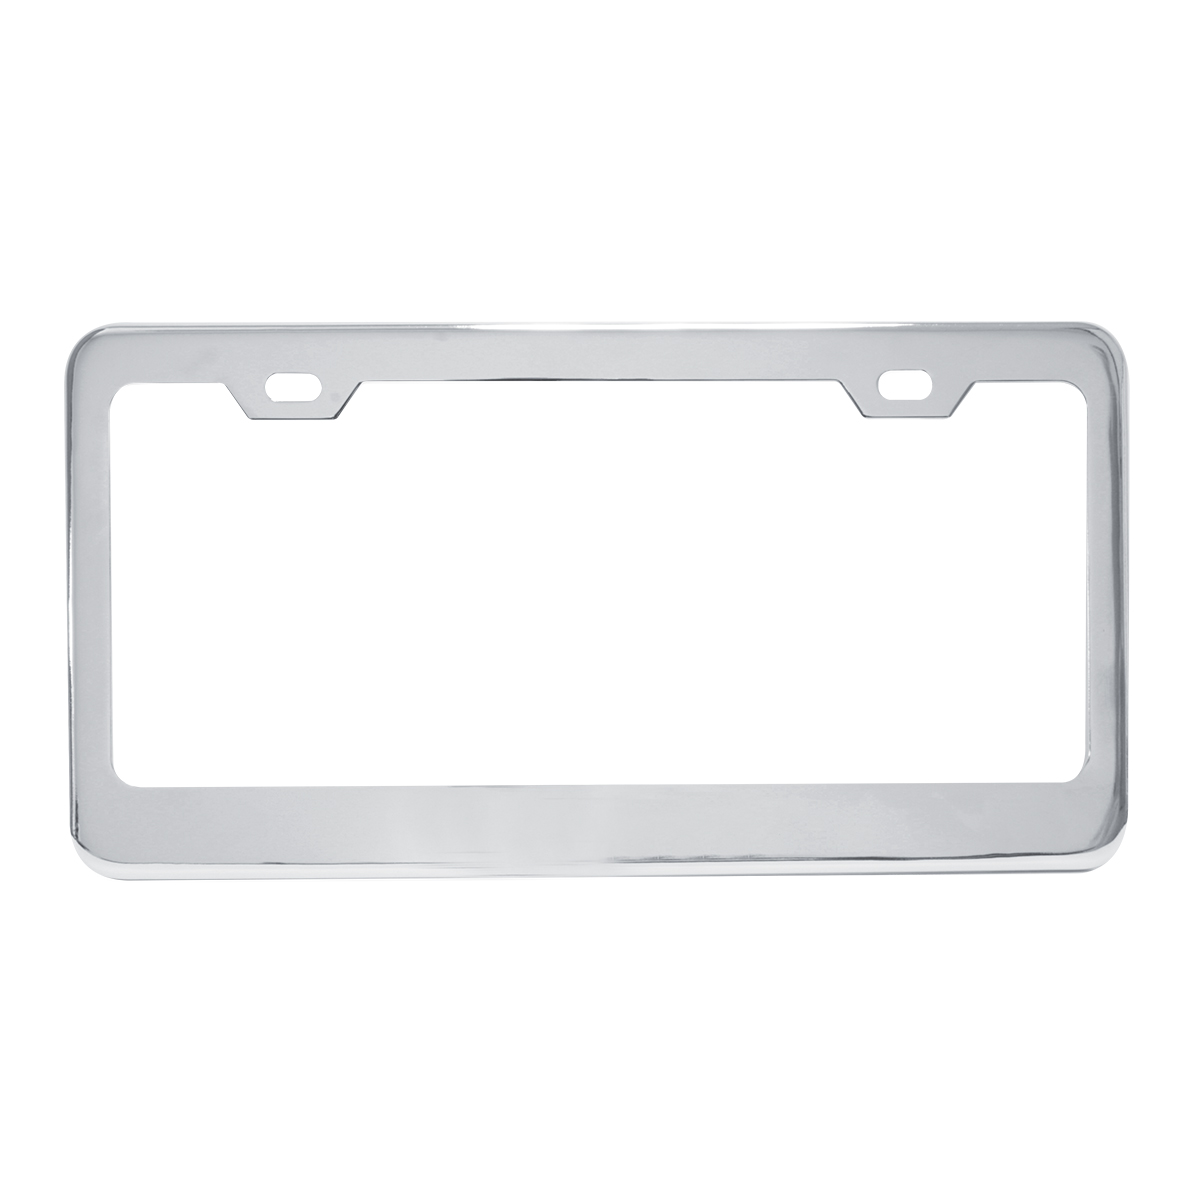 60440 Plain Chrome Plated Steel 2 Hole License Plate Frame